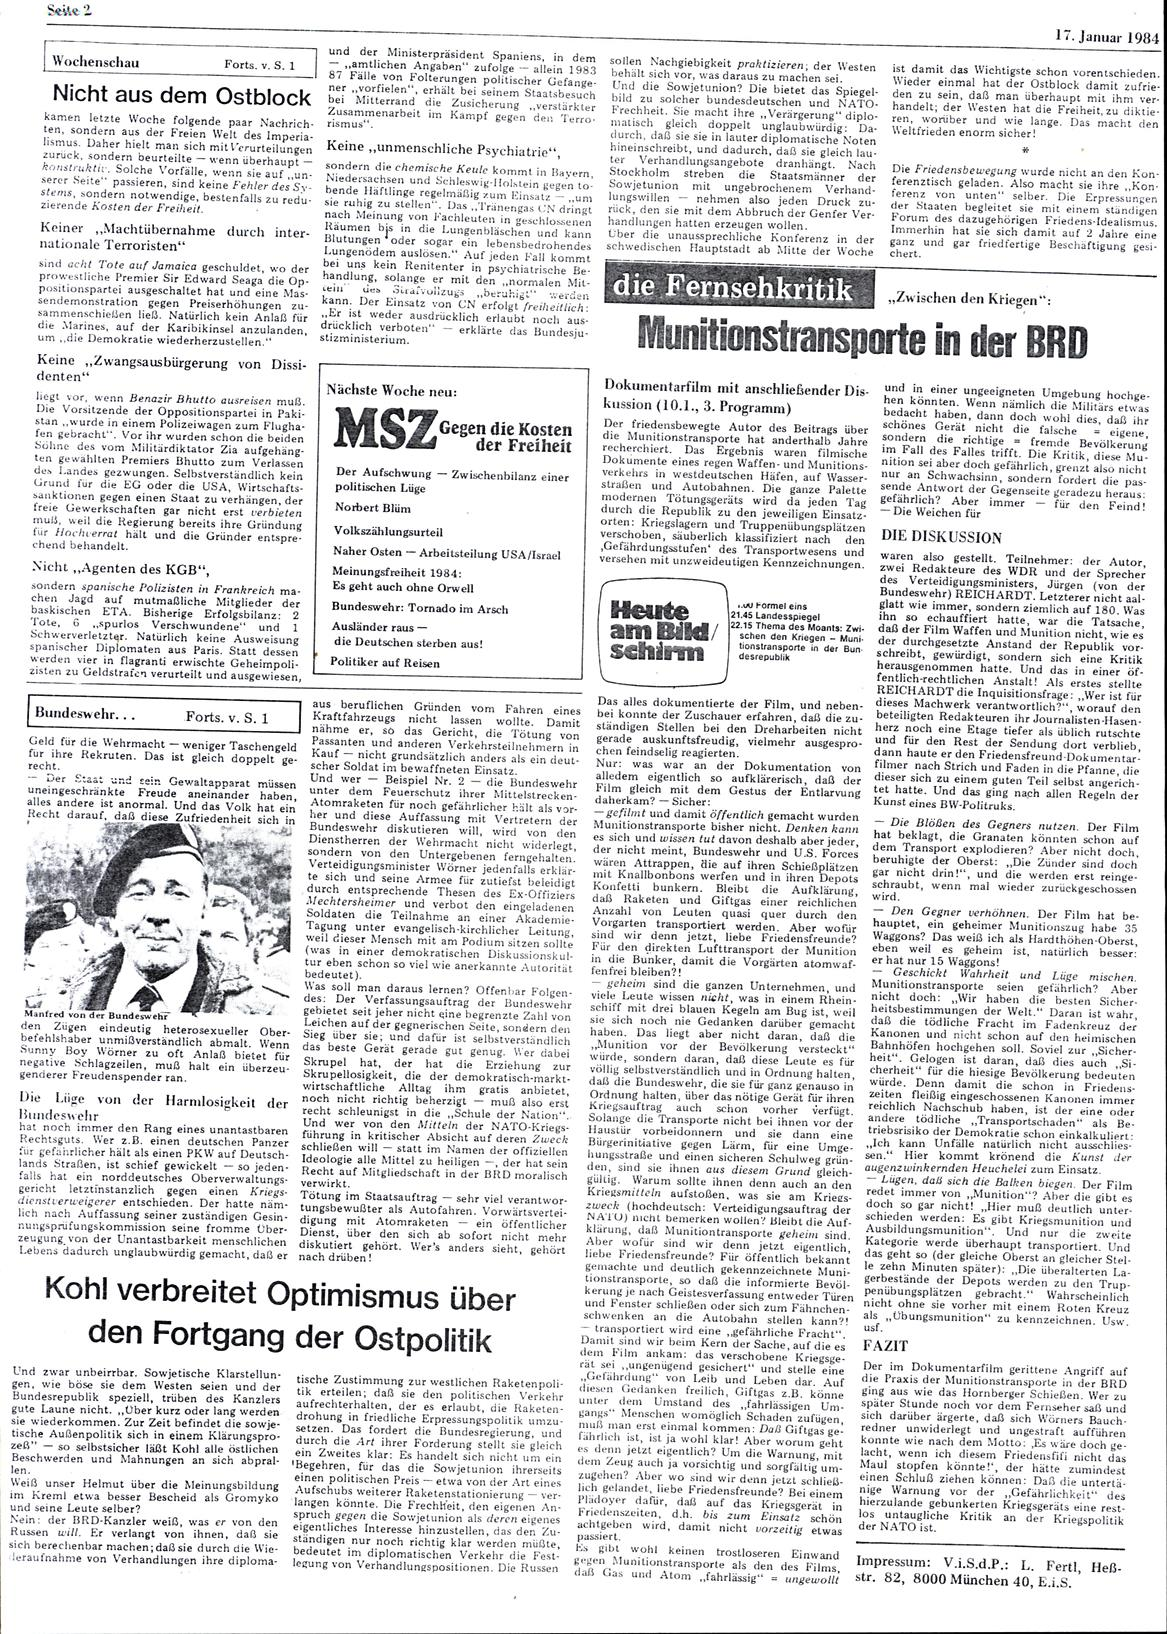 Bochum_BHZ_19840117_085_002